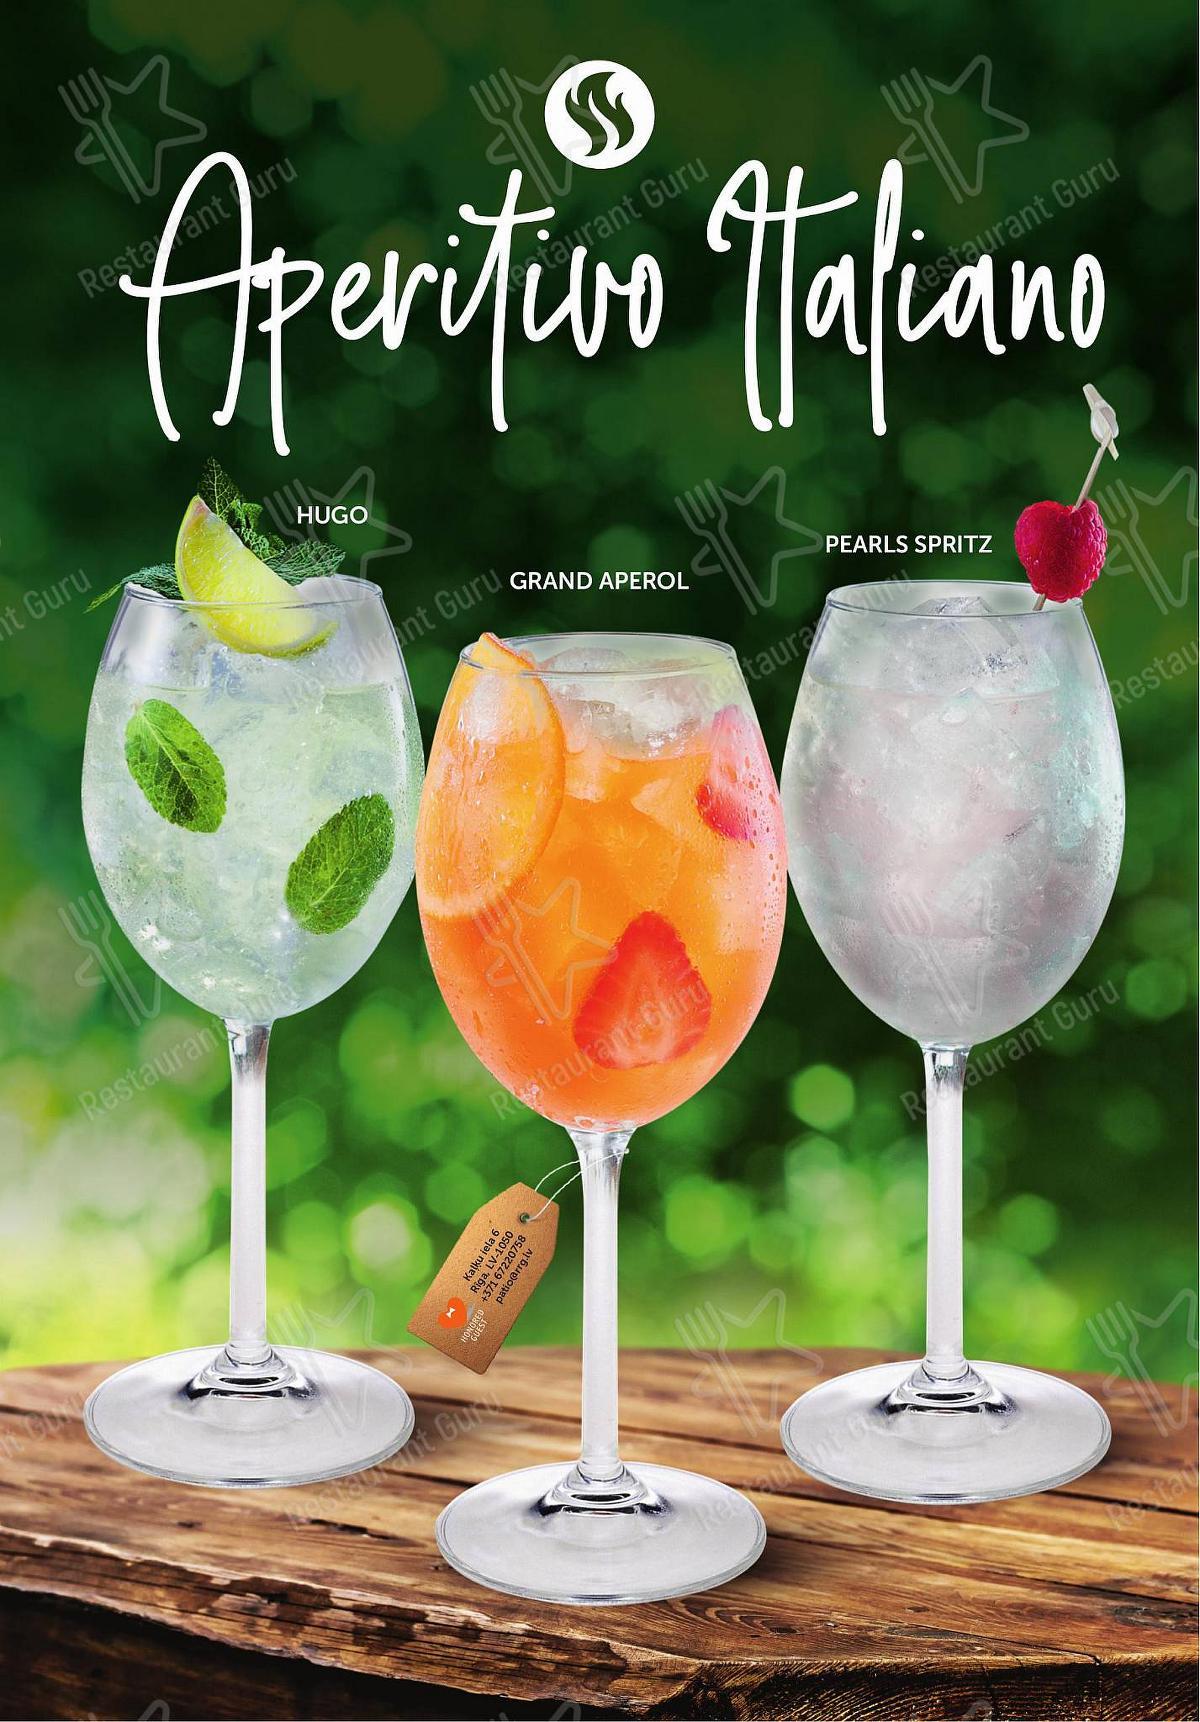 Menu for the Il Patio restaurant